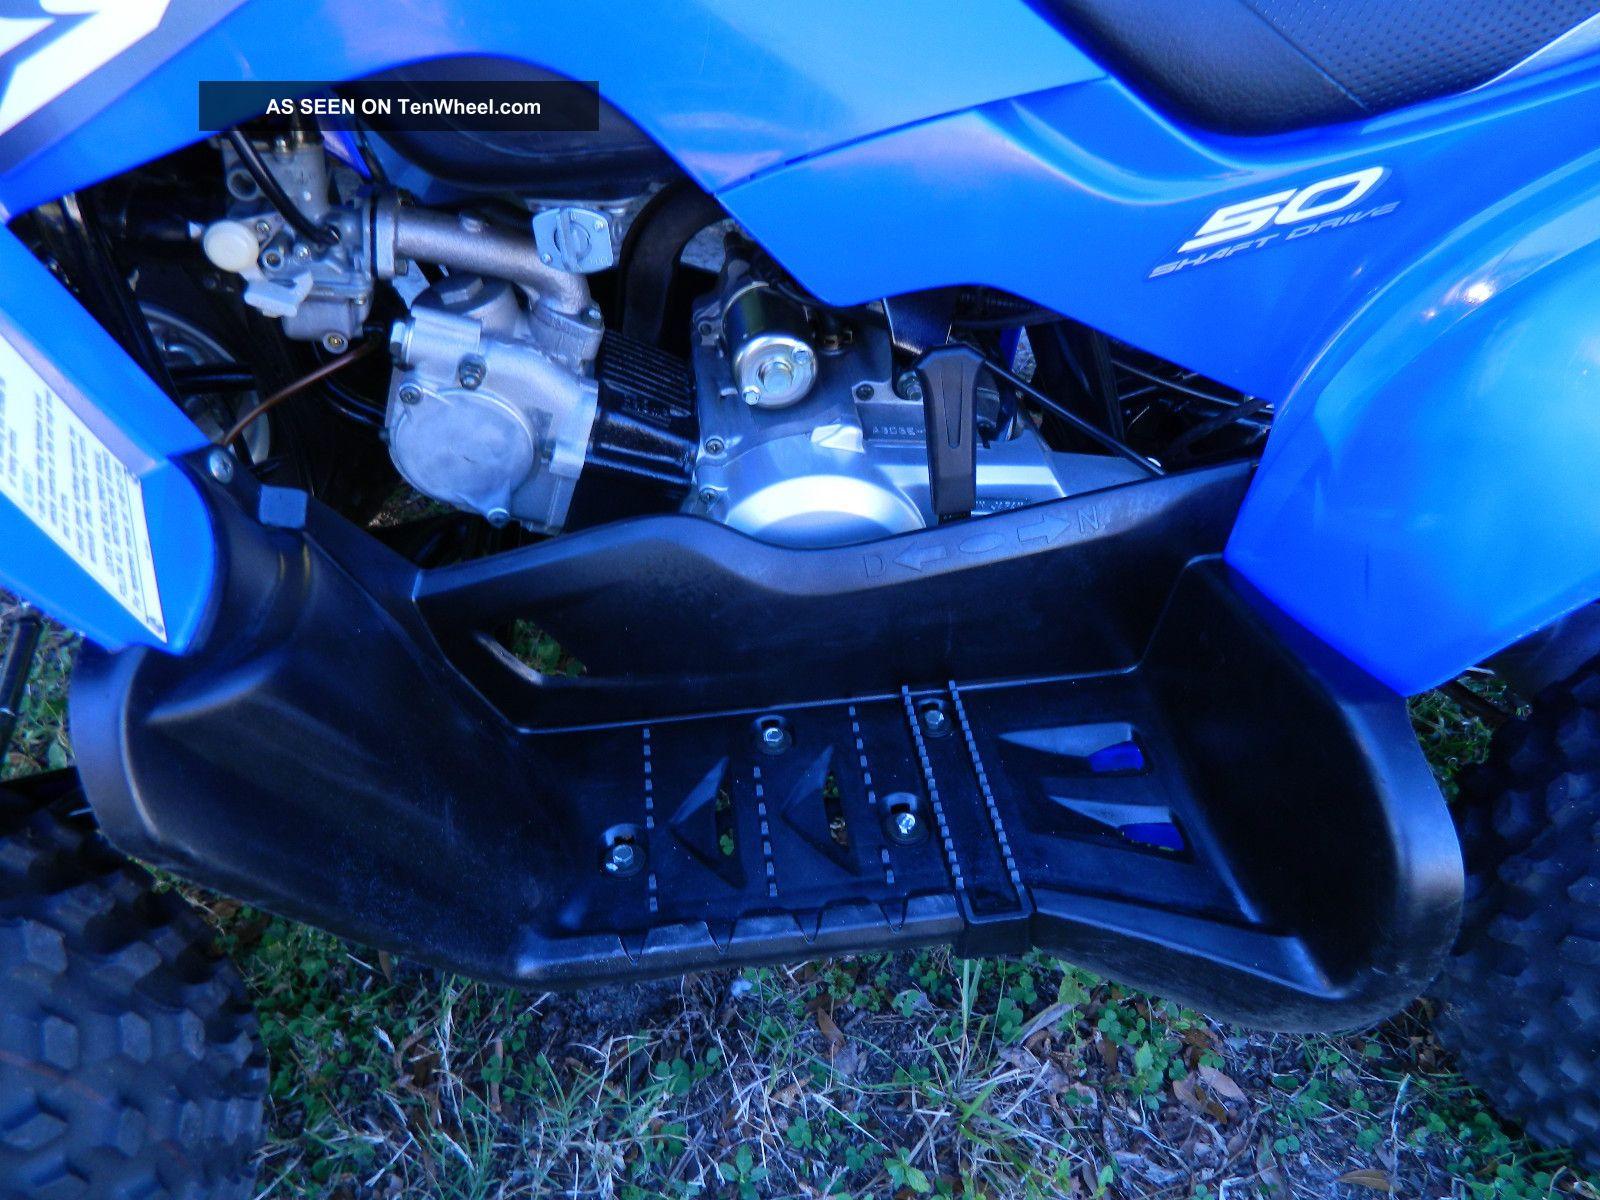 2007 yamaha raptor 50 automatic runs perfect shaft drive. Black Bedroom Furniture Sets. Home Design Ideas